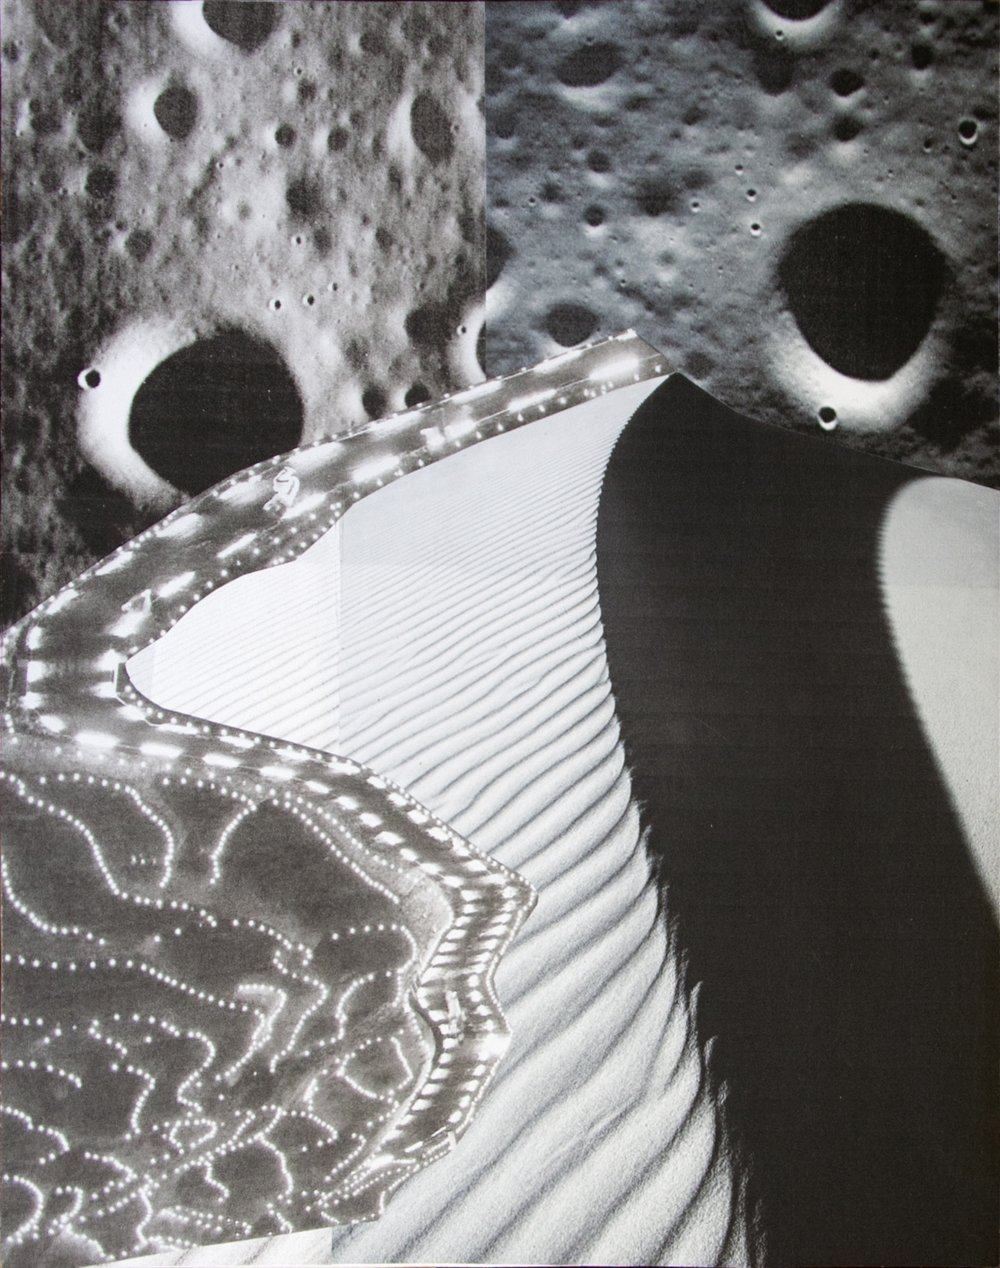 Lunar Dune, collage on paper